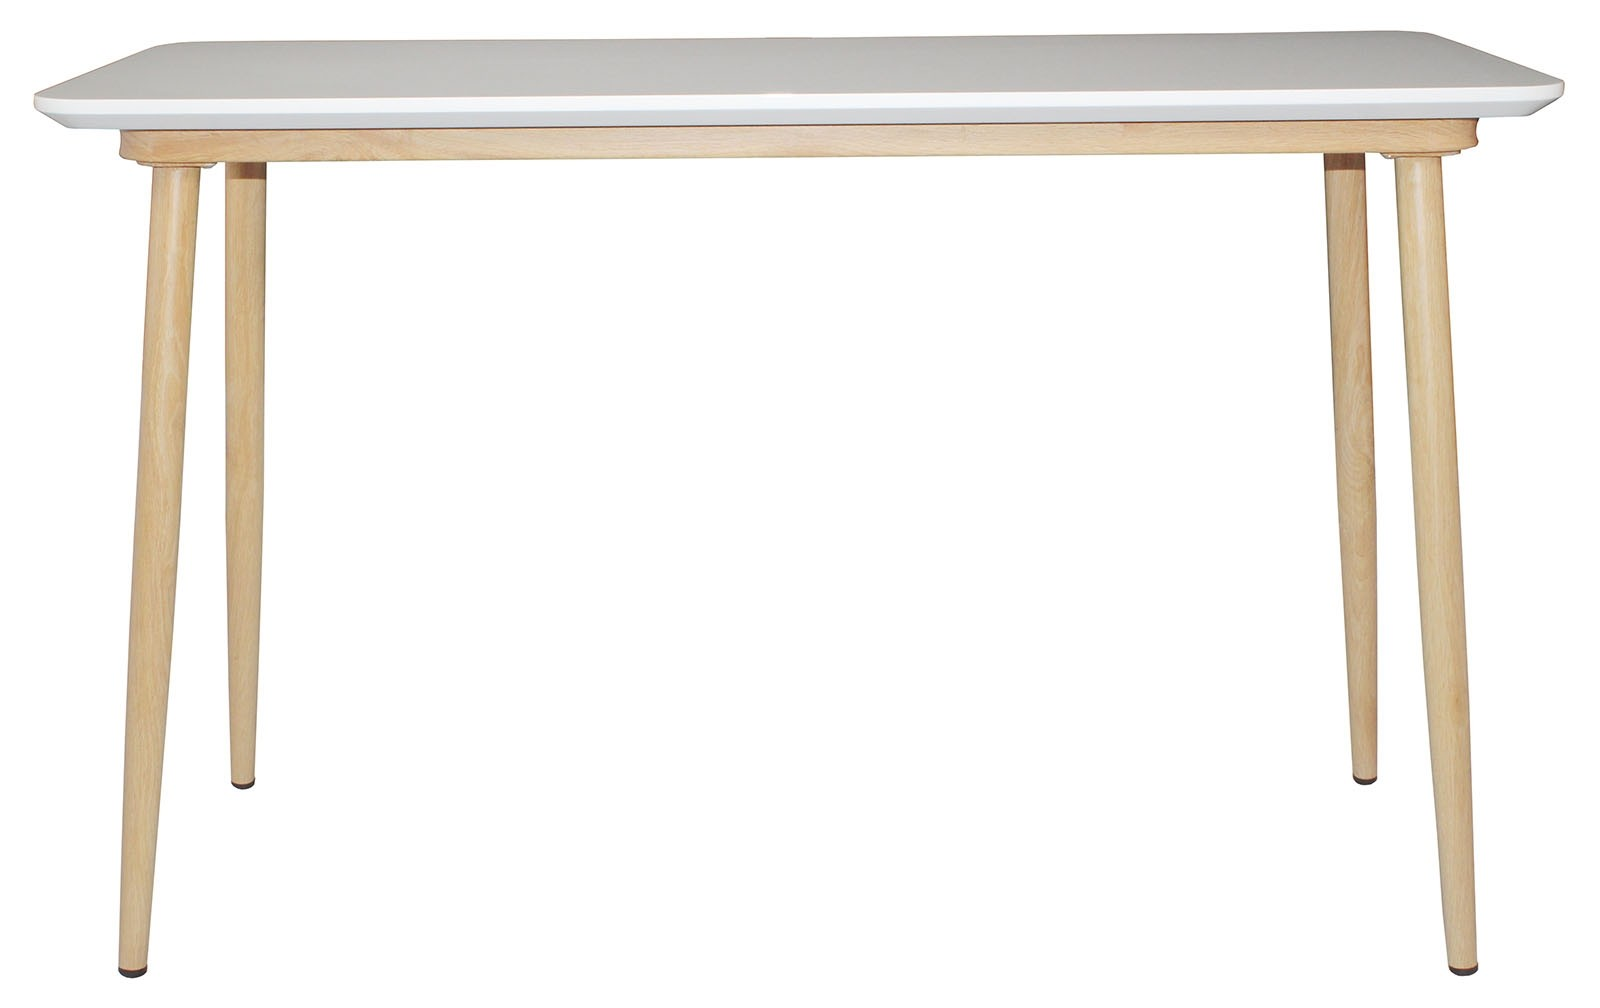 CONTEMPORARY Console Table - White